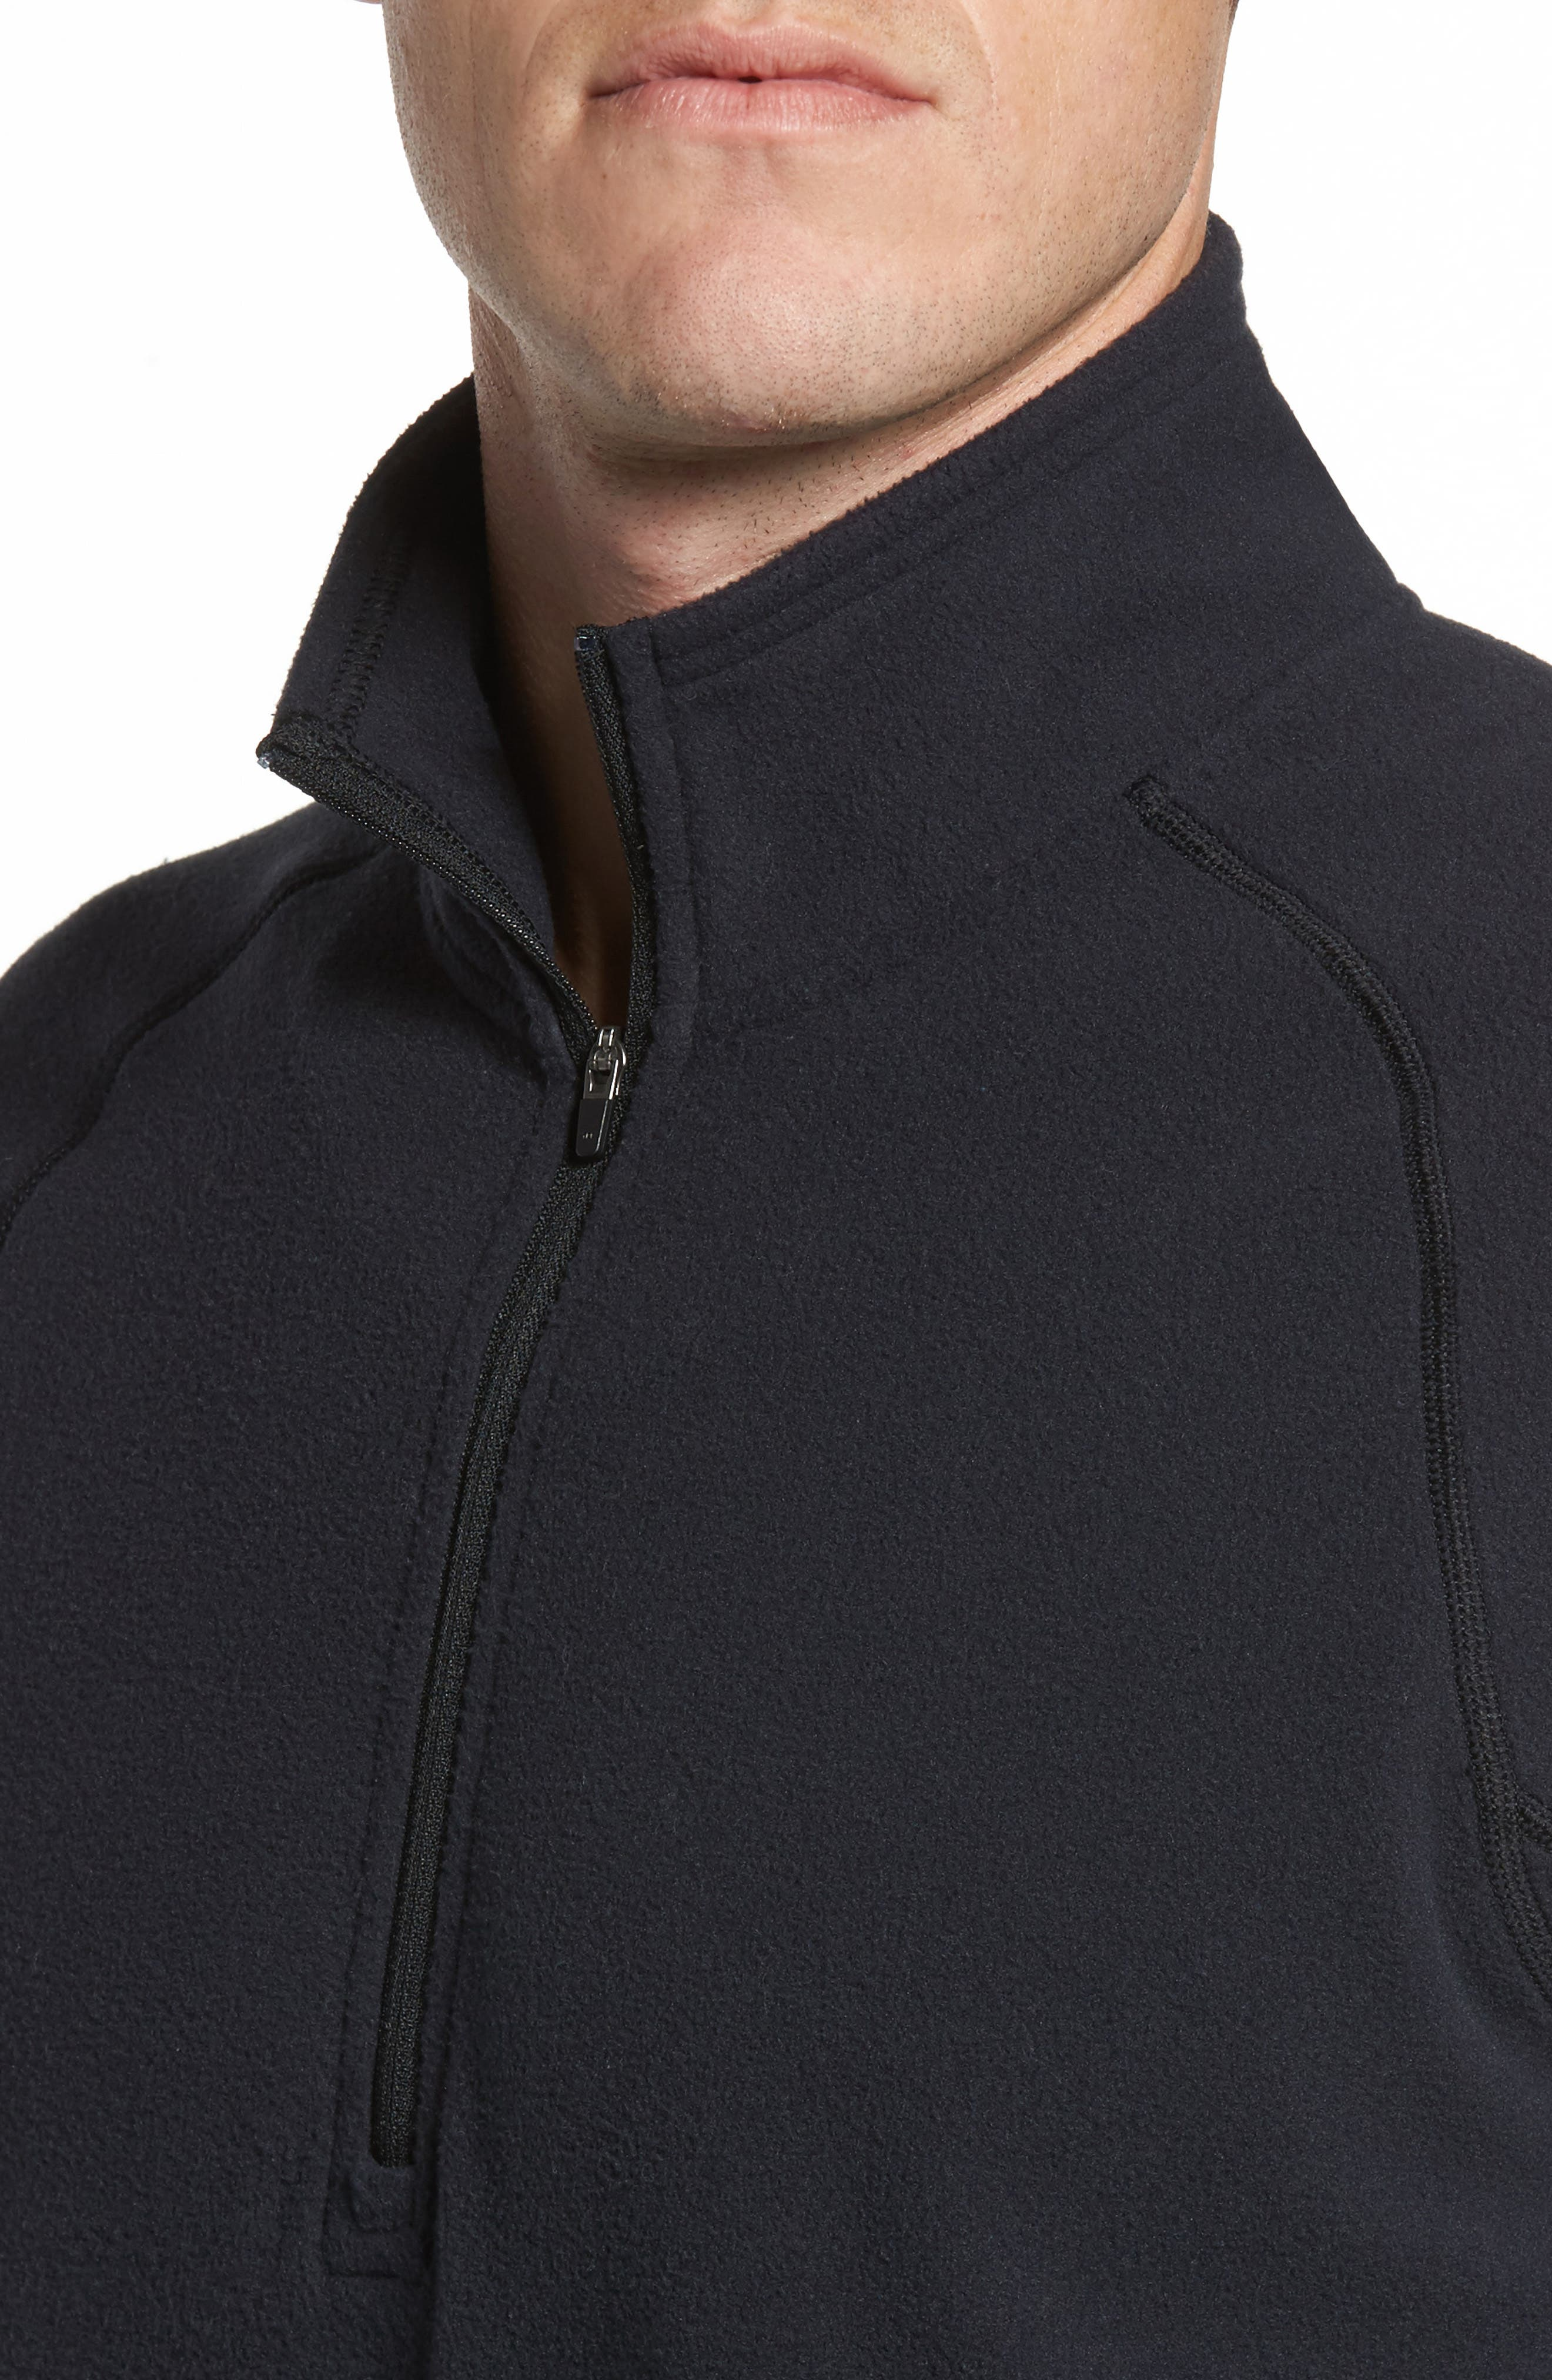 Quarter Zip Fleece Pullover,                             Alternate thumbnail 4, color,                             001